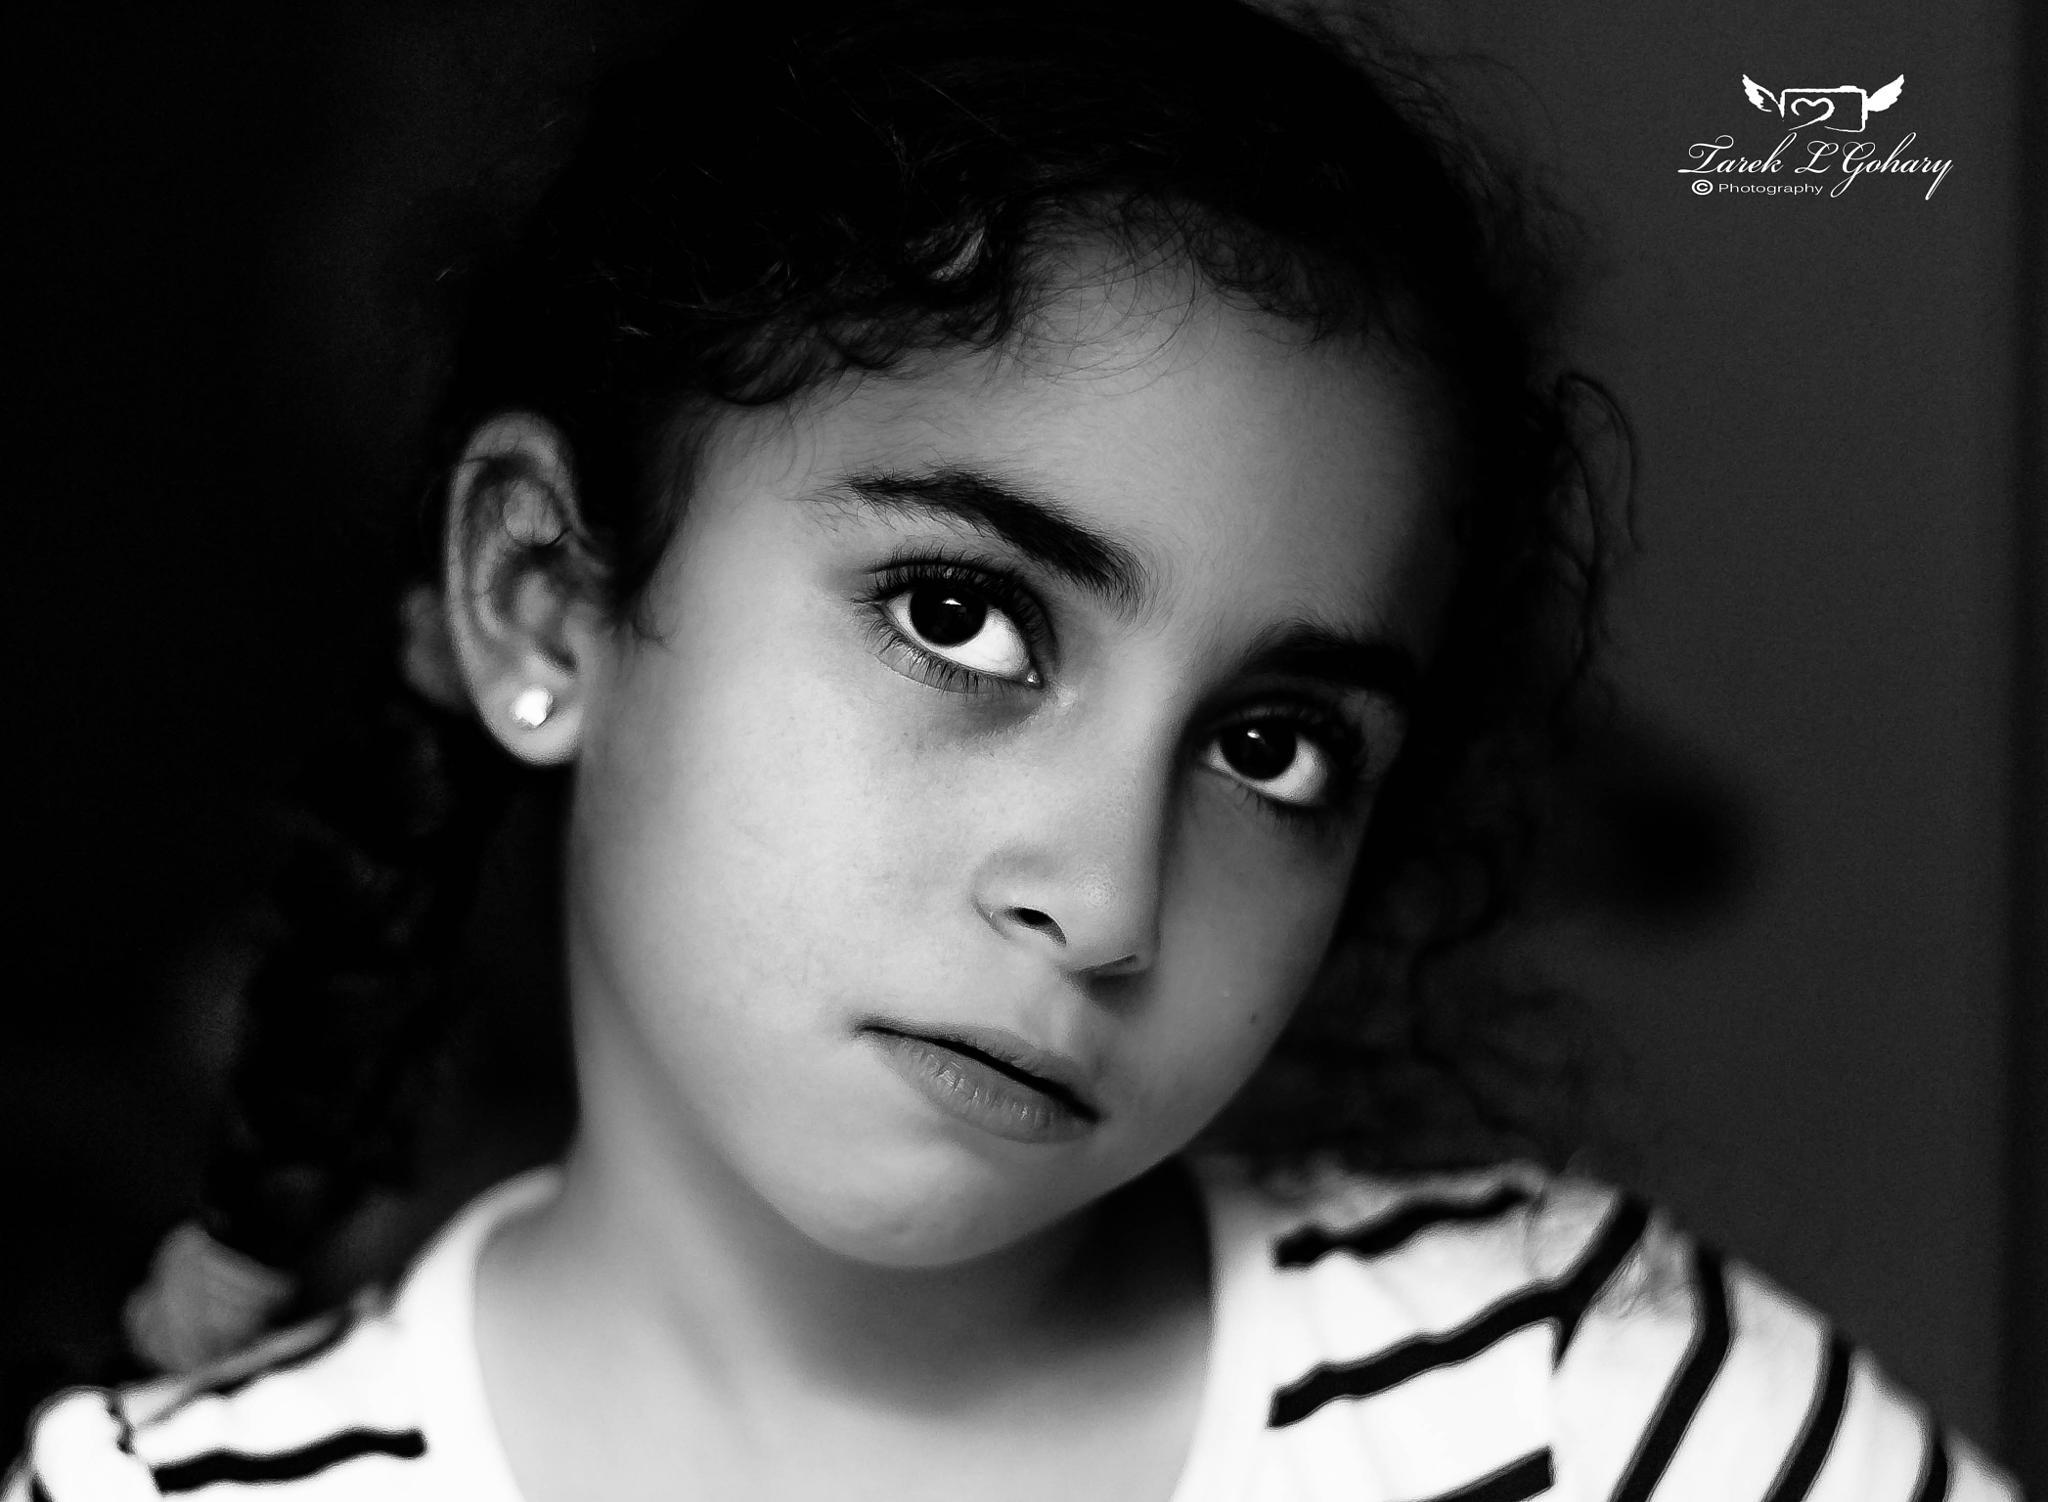 7 years of beauty  by Tarek L Gohary